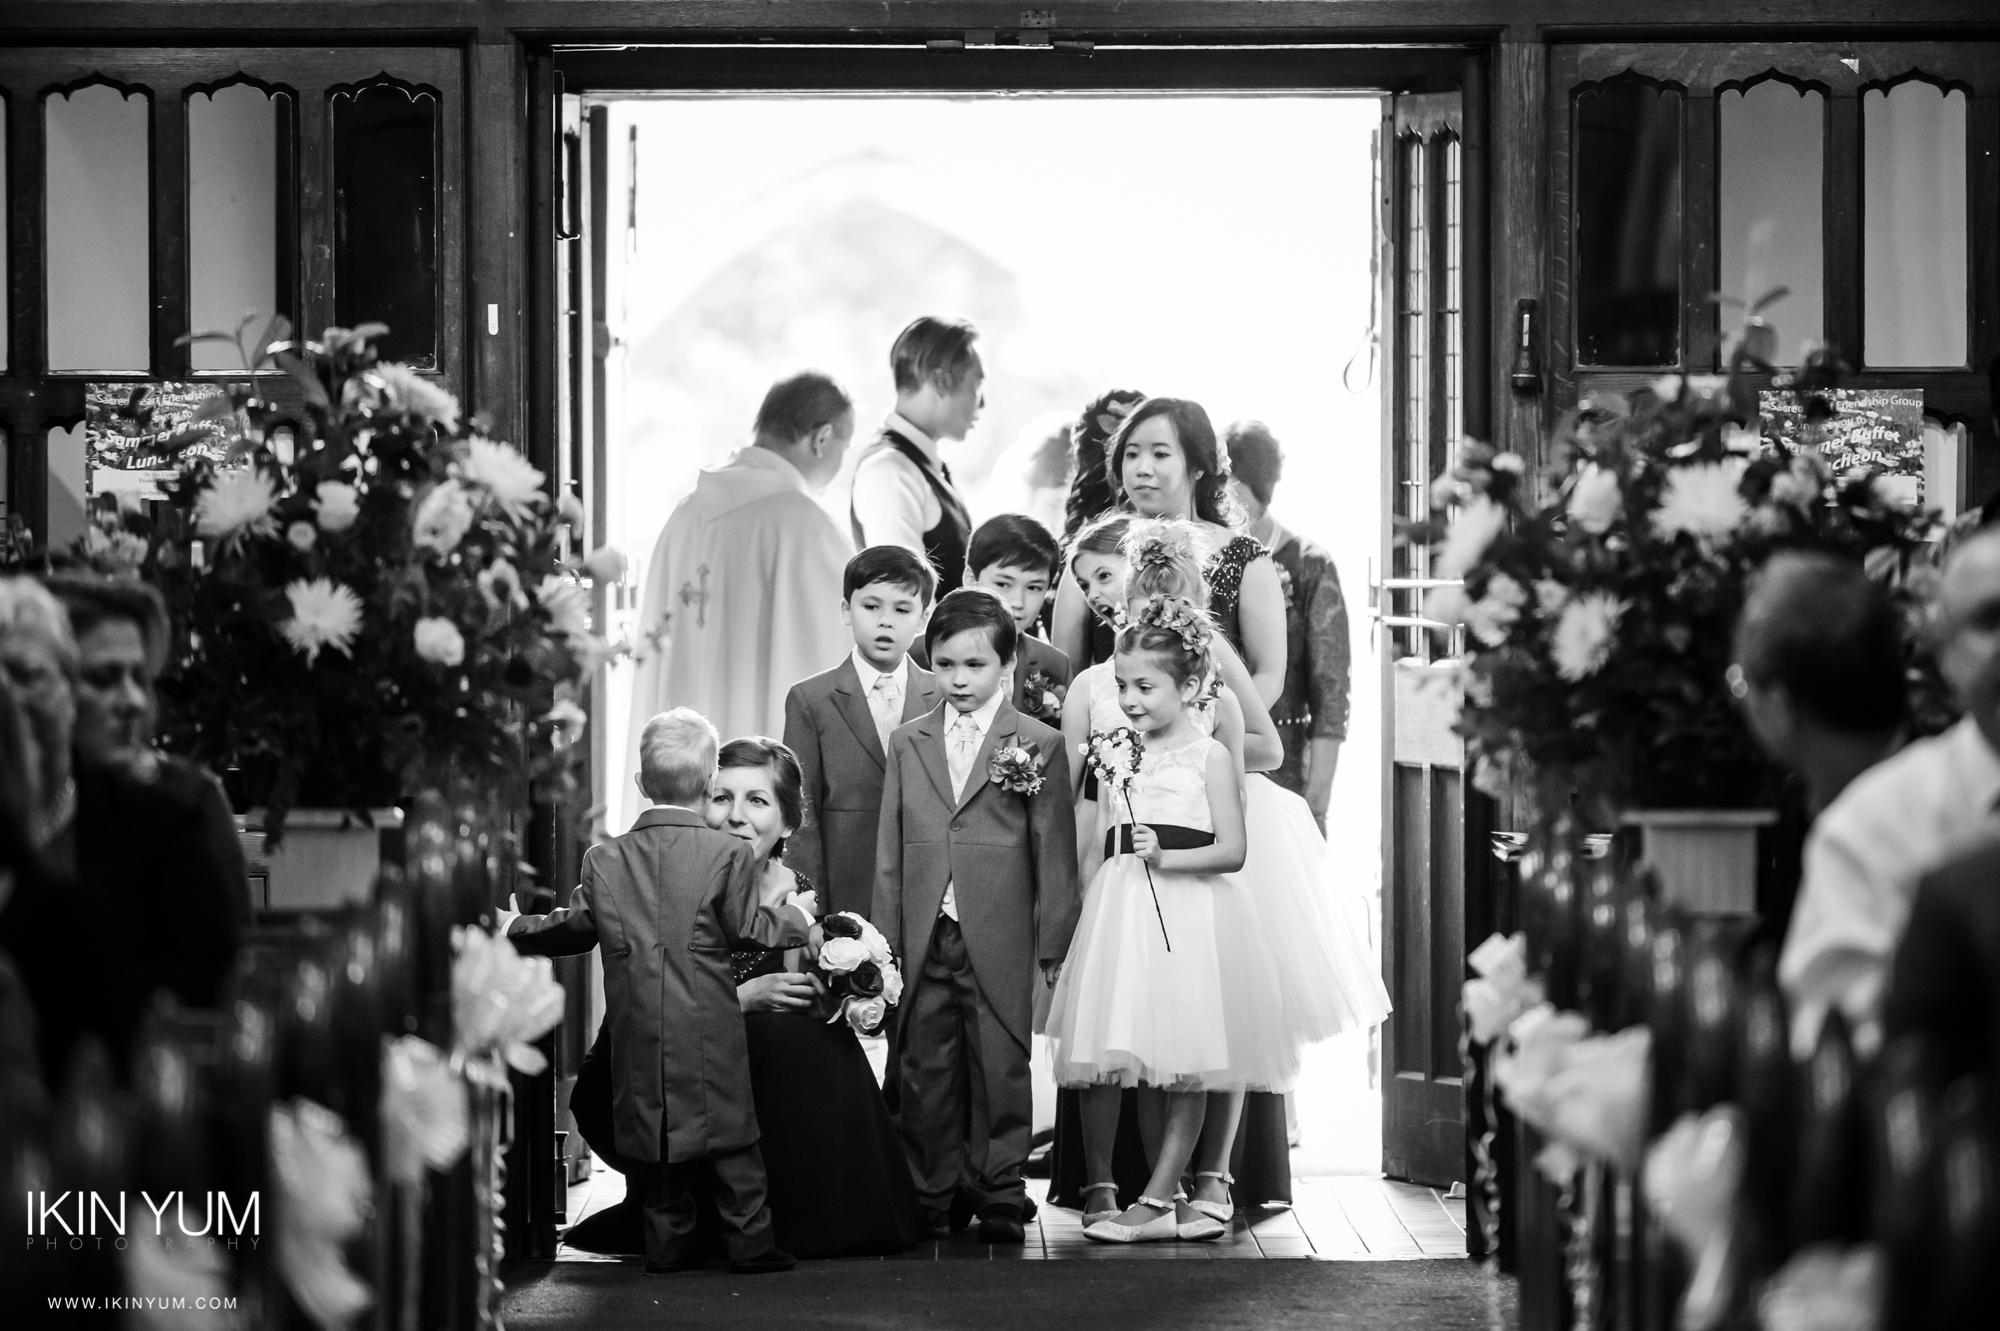 Teresa & Johnathan Weddong Day - The Ceremony-0027.jpg